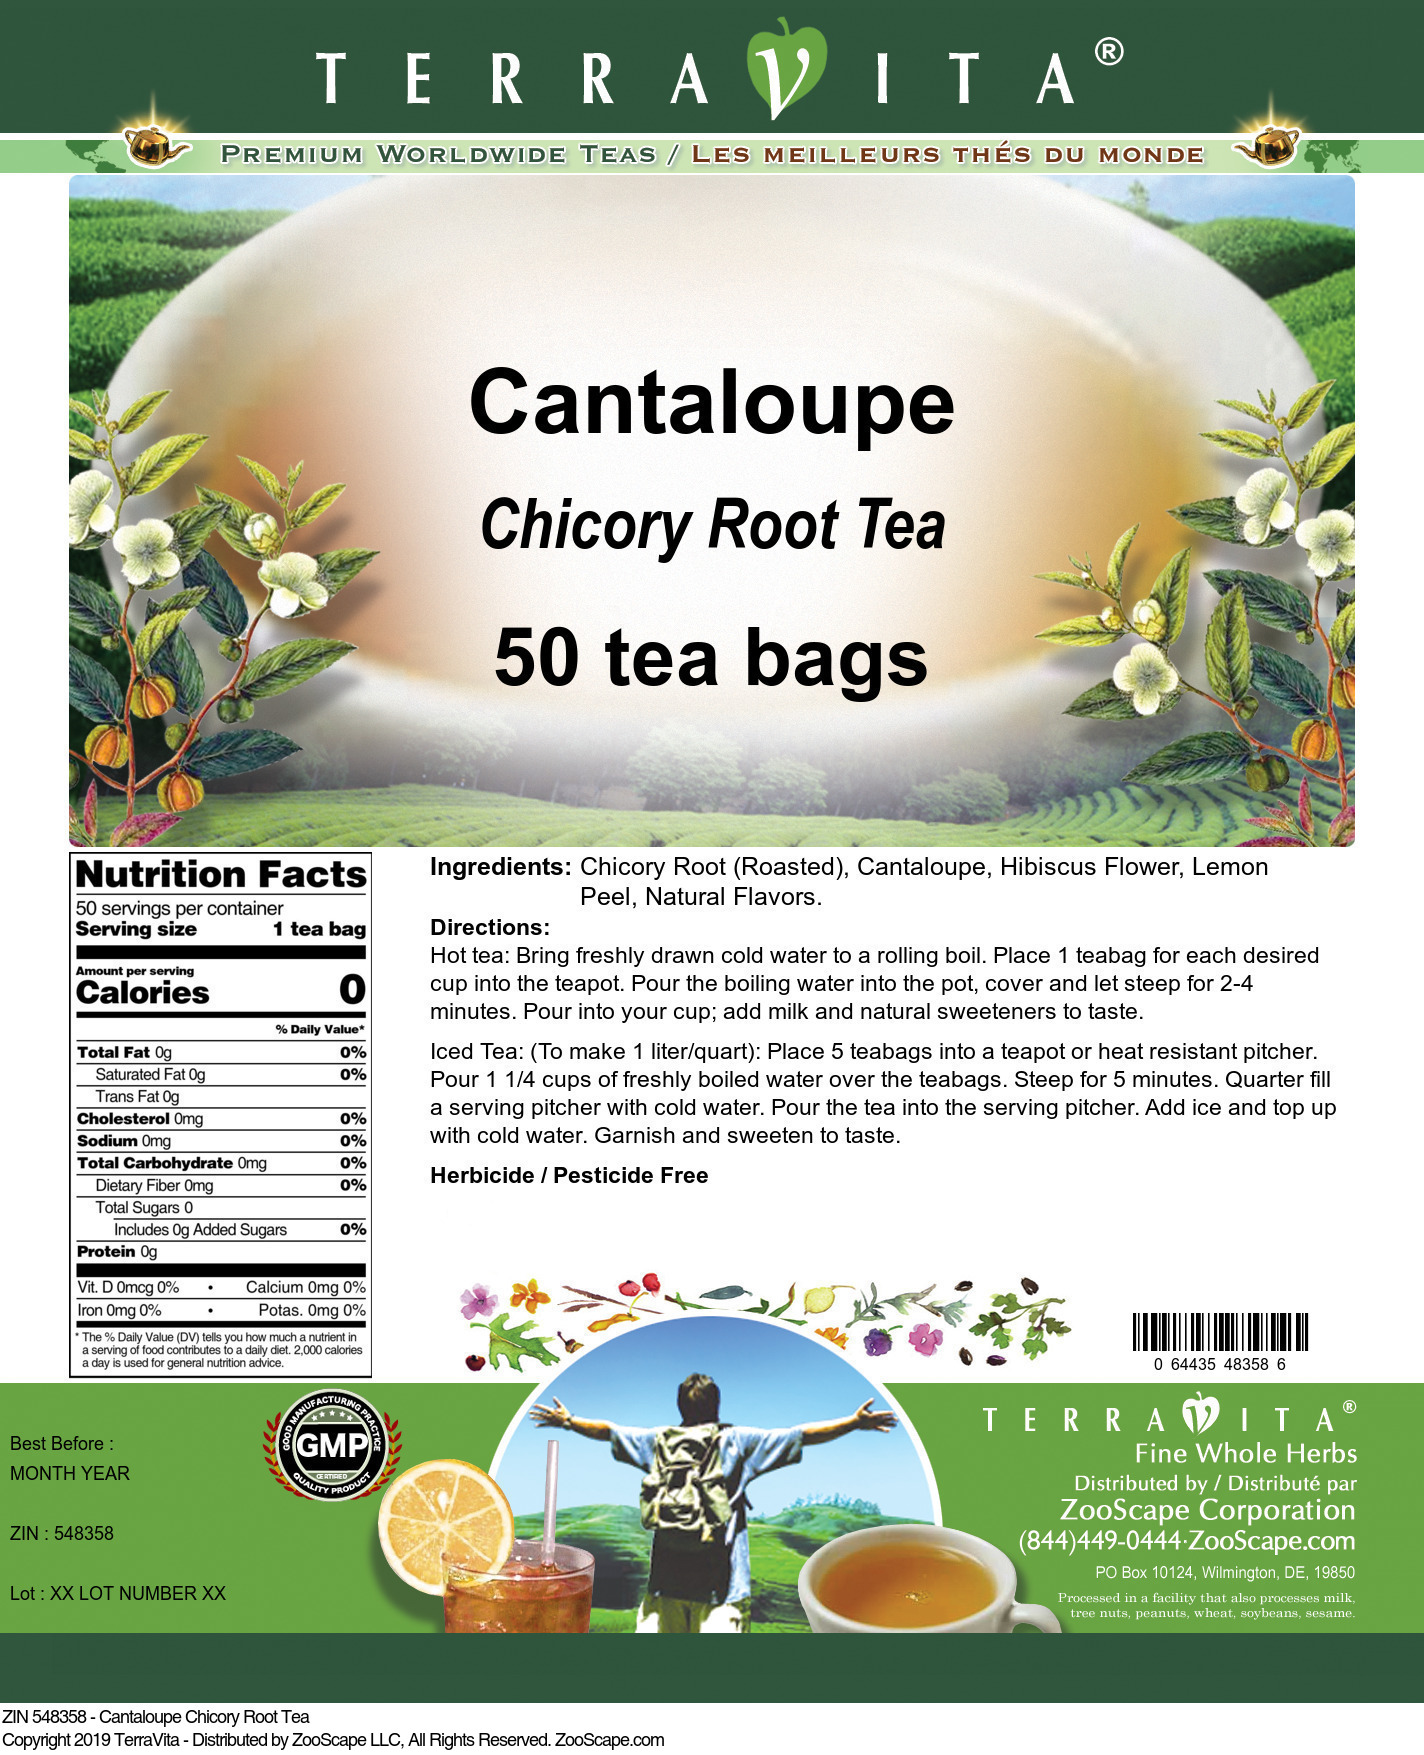 Cantaloupe Chicory Root Tea